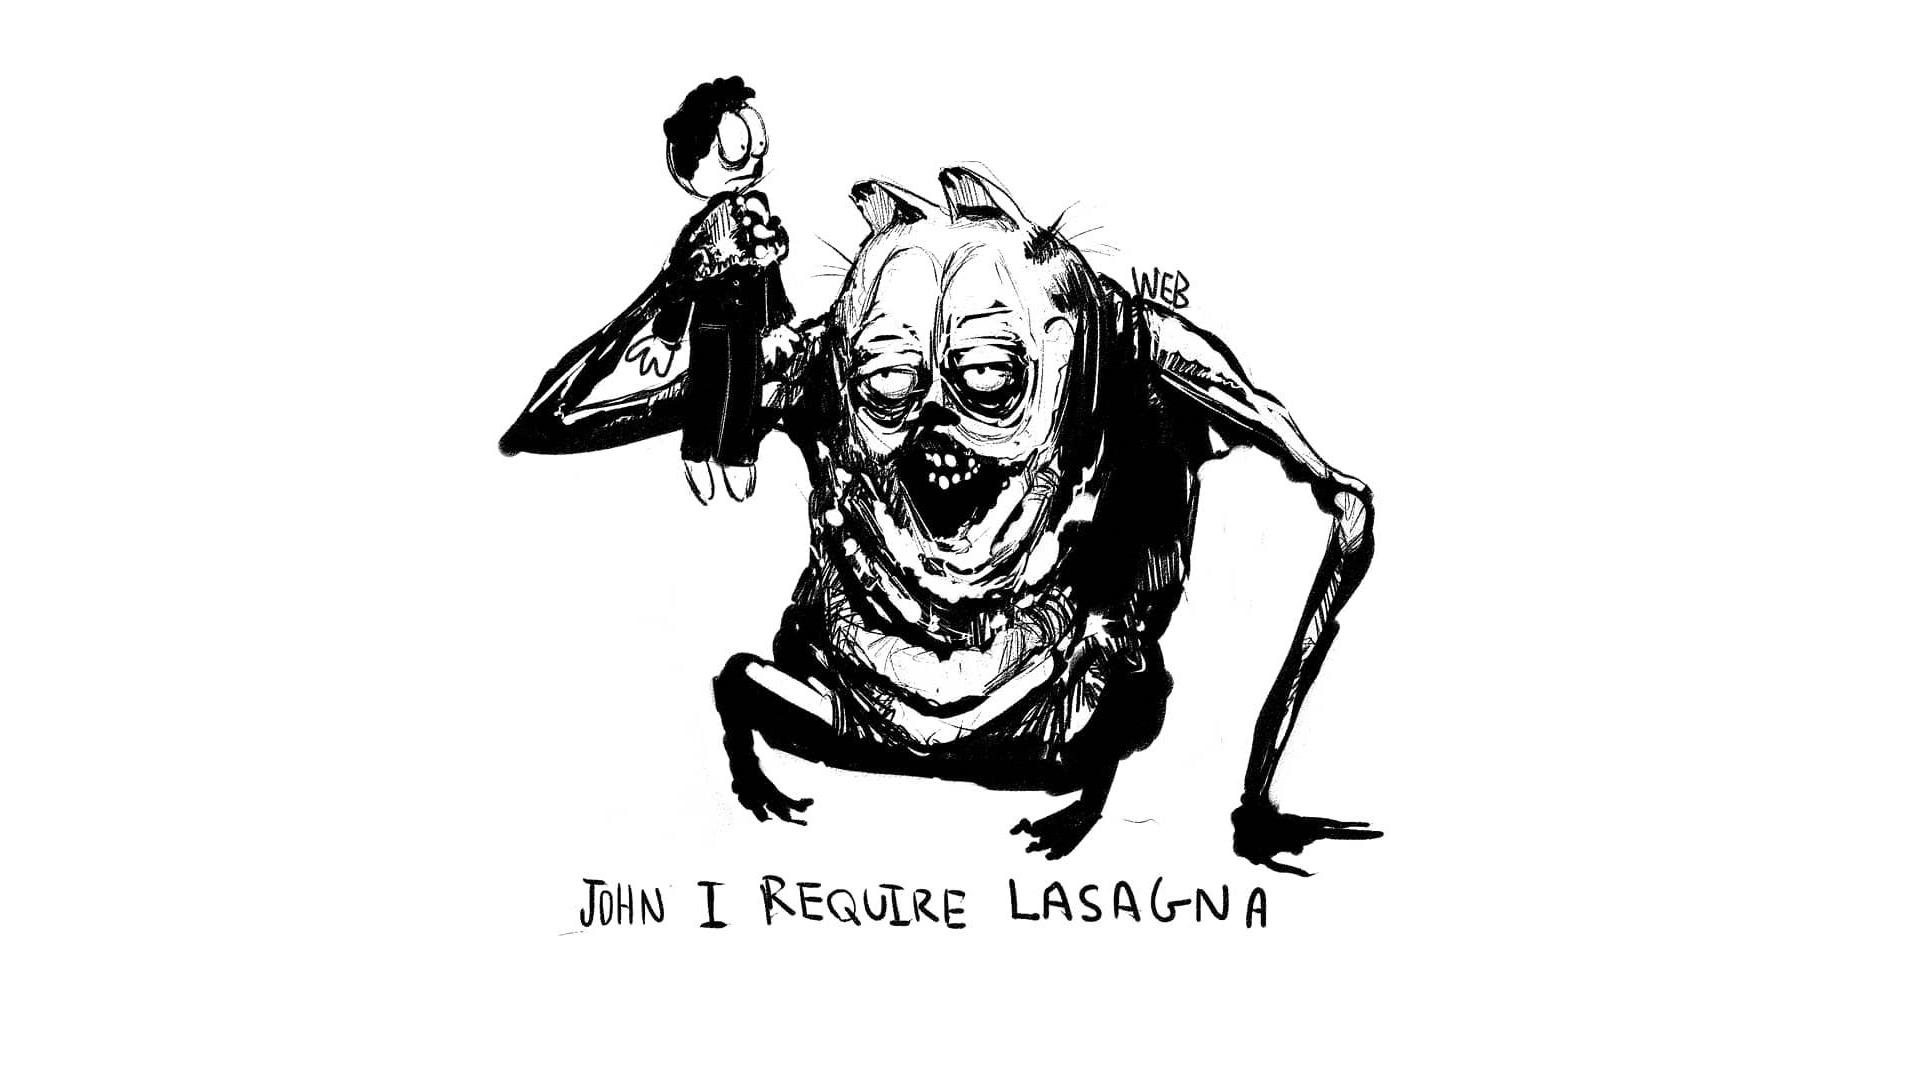 Creepy Garfield | Know Your Meme